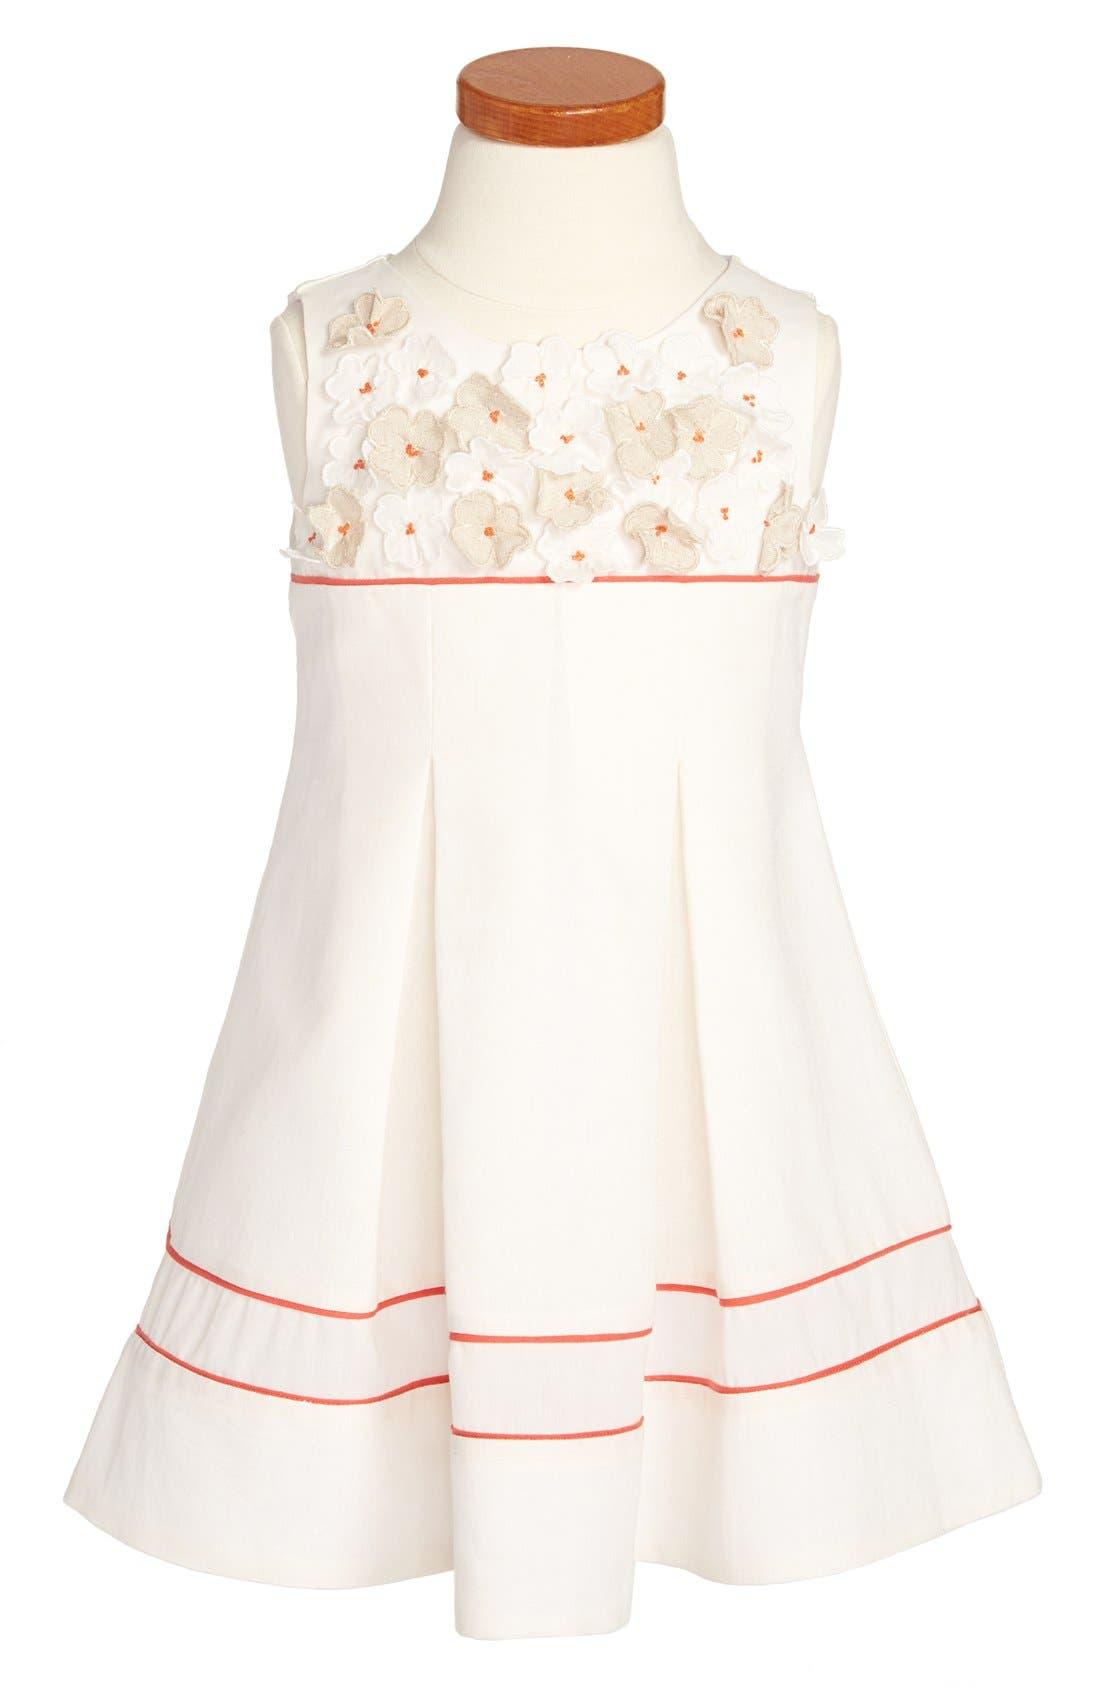 Main Image - Luli & Me Sleeveless Dress (Toddler Girls, Little Girls & Big Girls)